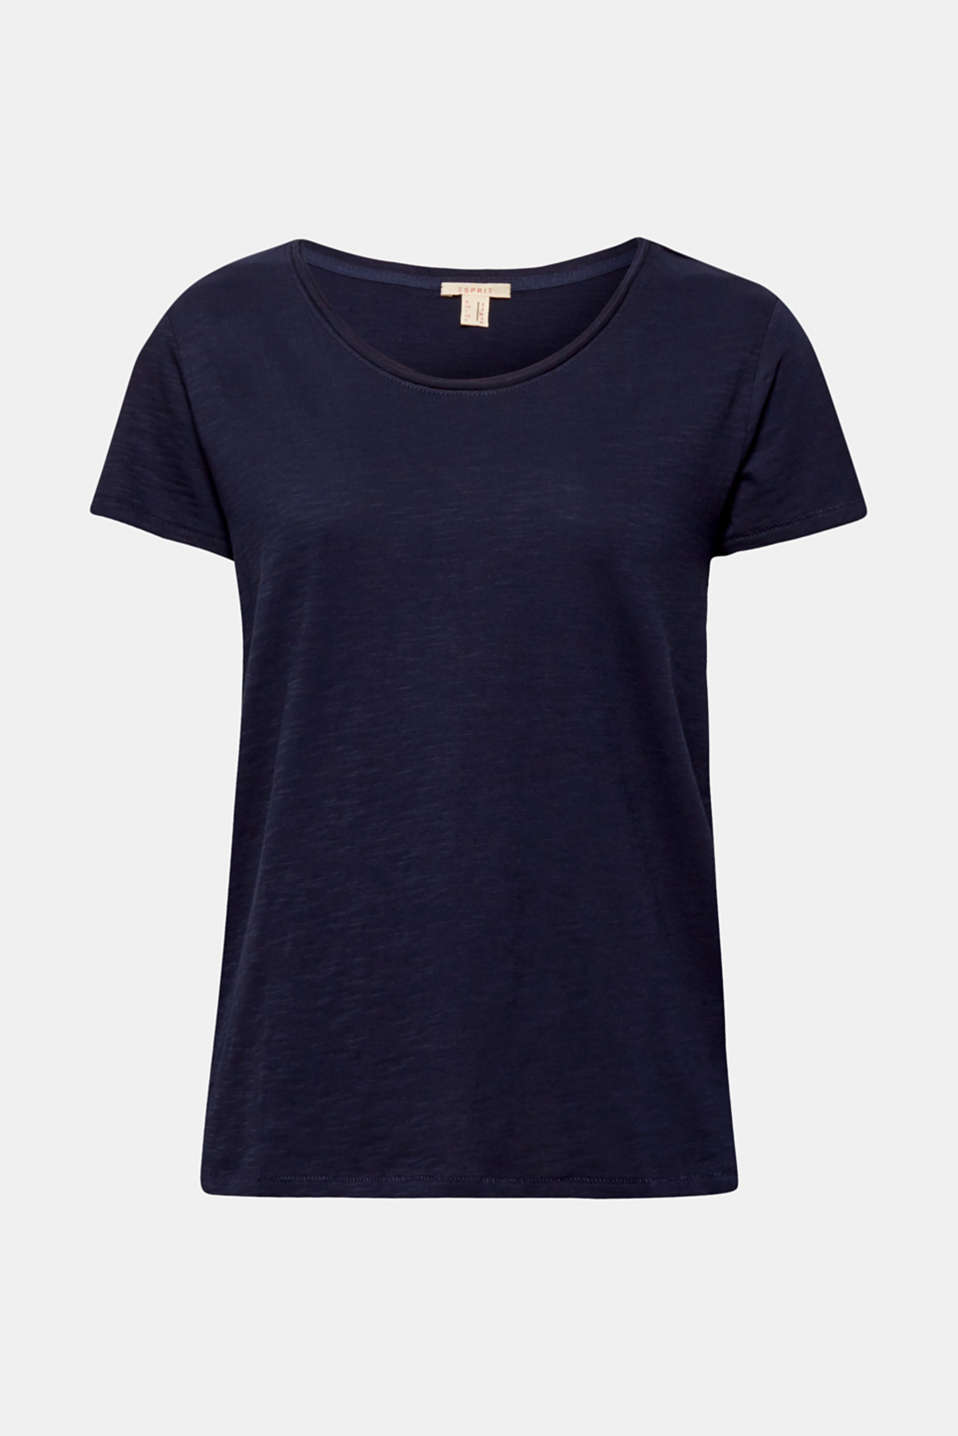 Lightweight slub T-shirt in 100% cotton, NAVY, detail image number 6